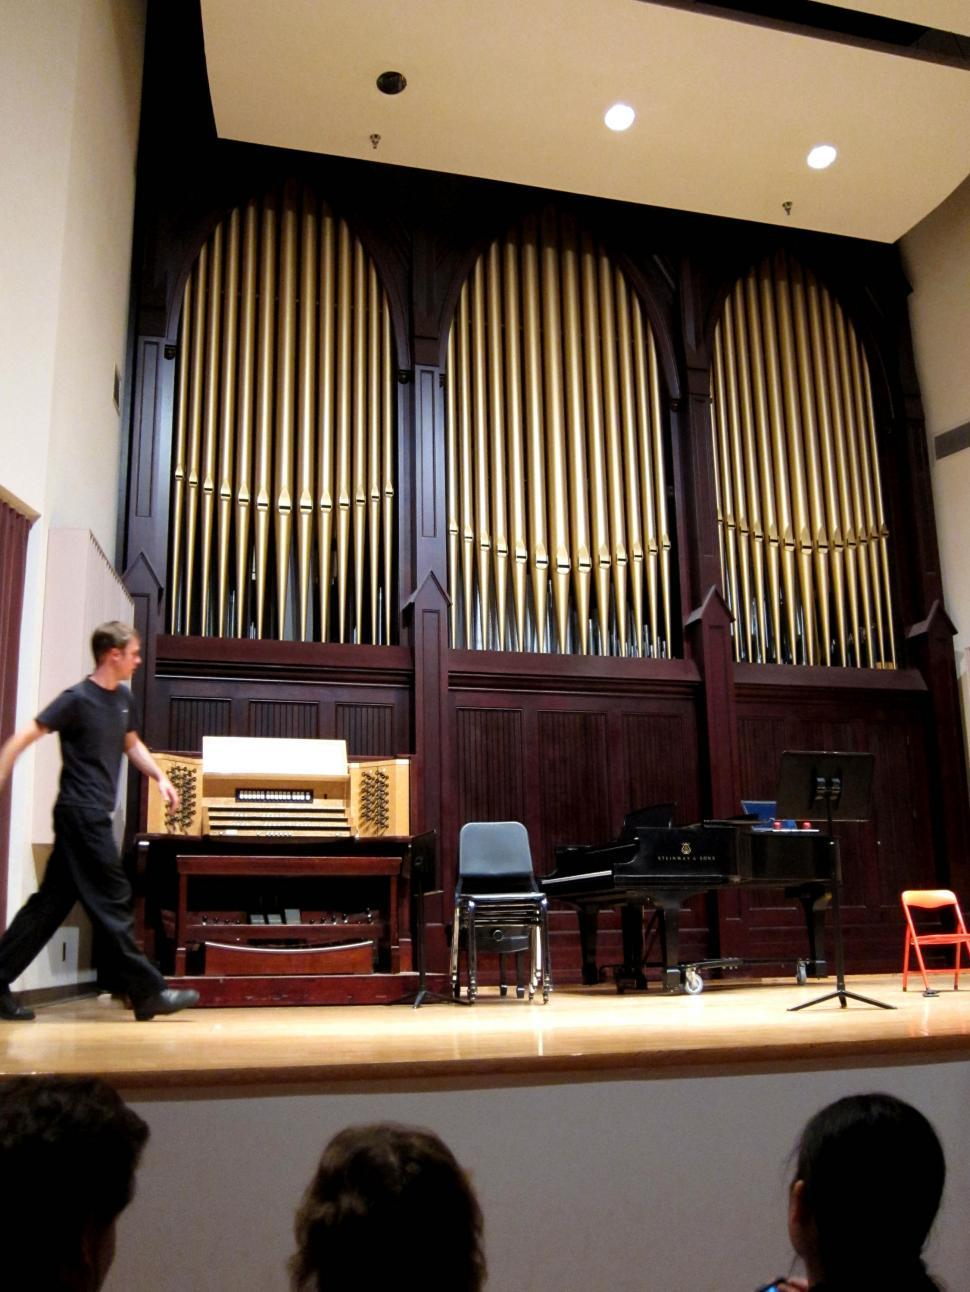 Download Free Stock HD Photo of auditorium pipe organ Online